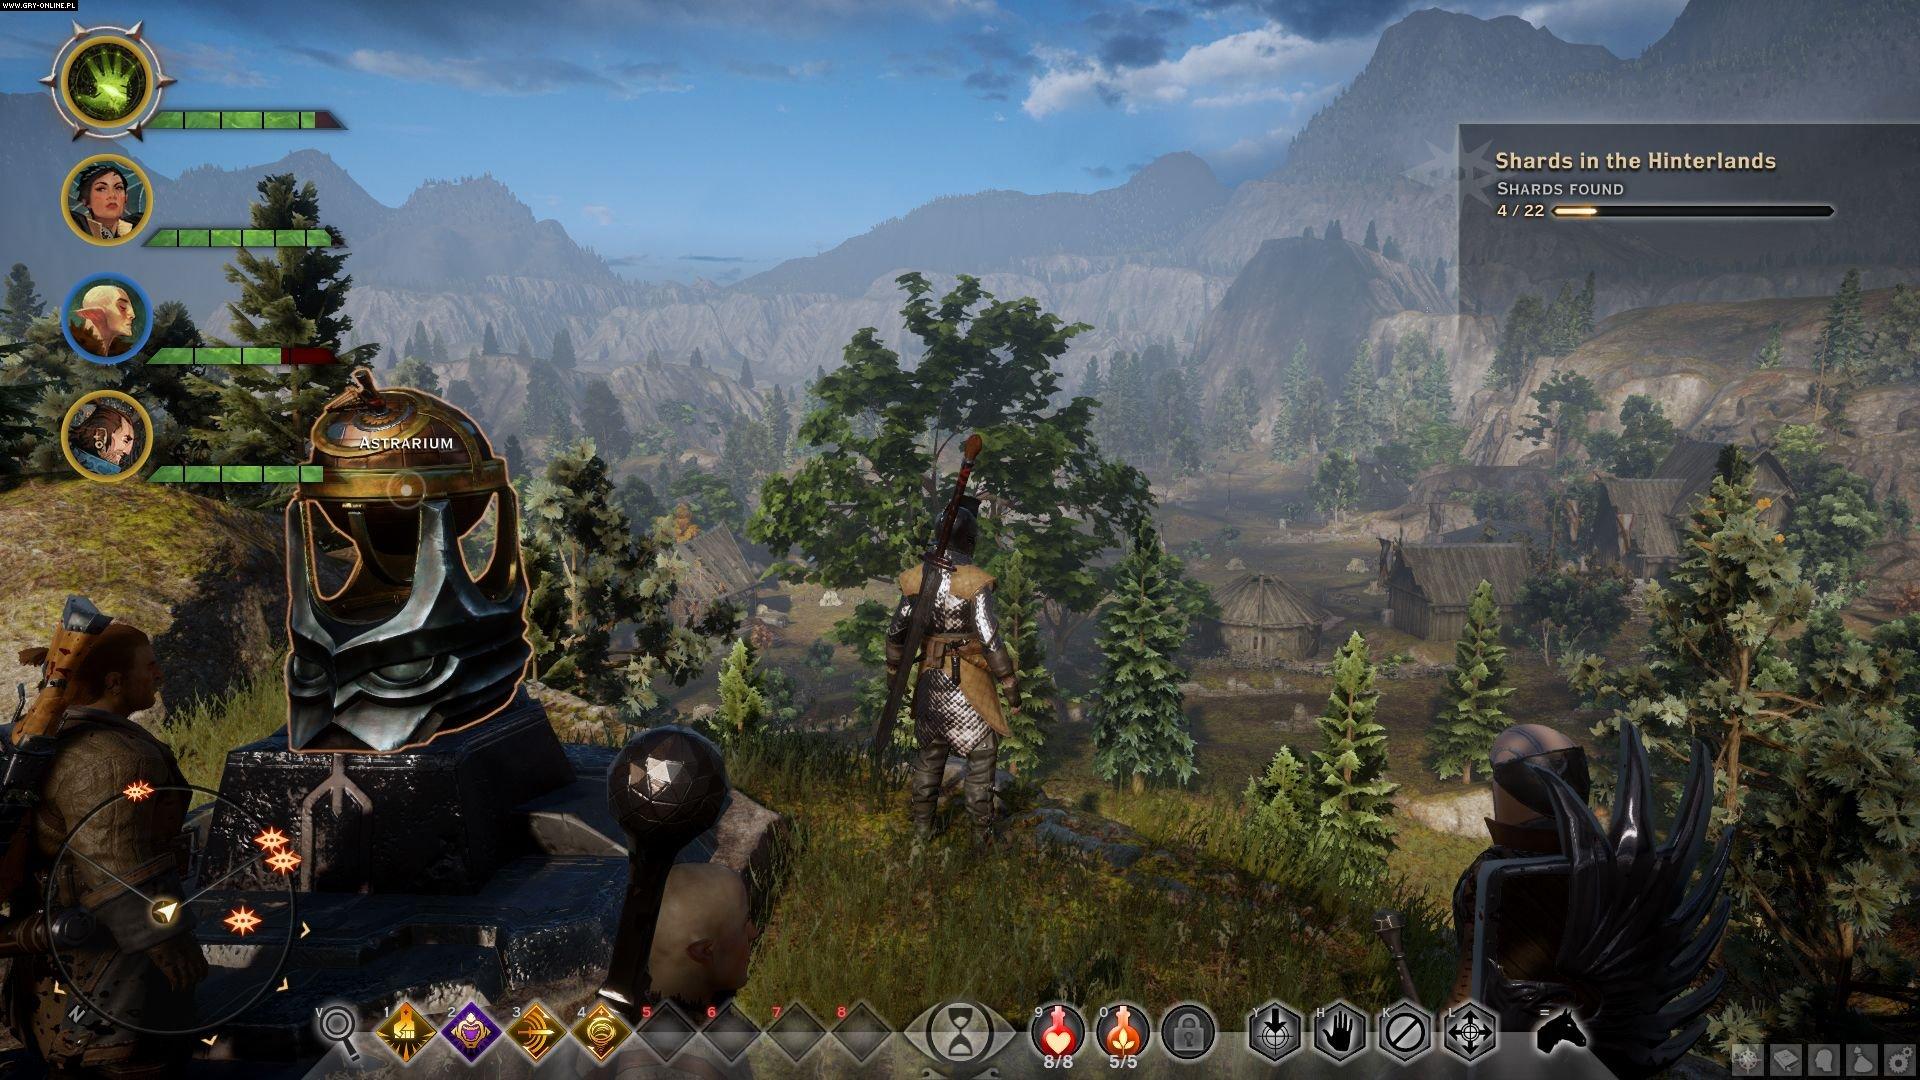 Dragon Age: Inquisition PC, X360, PS3 Games Image 4/225, BioWare Corporation, Electronic Arts Inc.